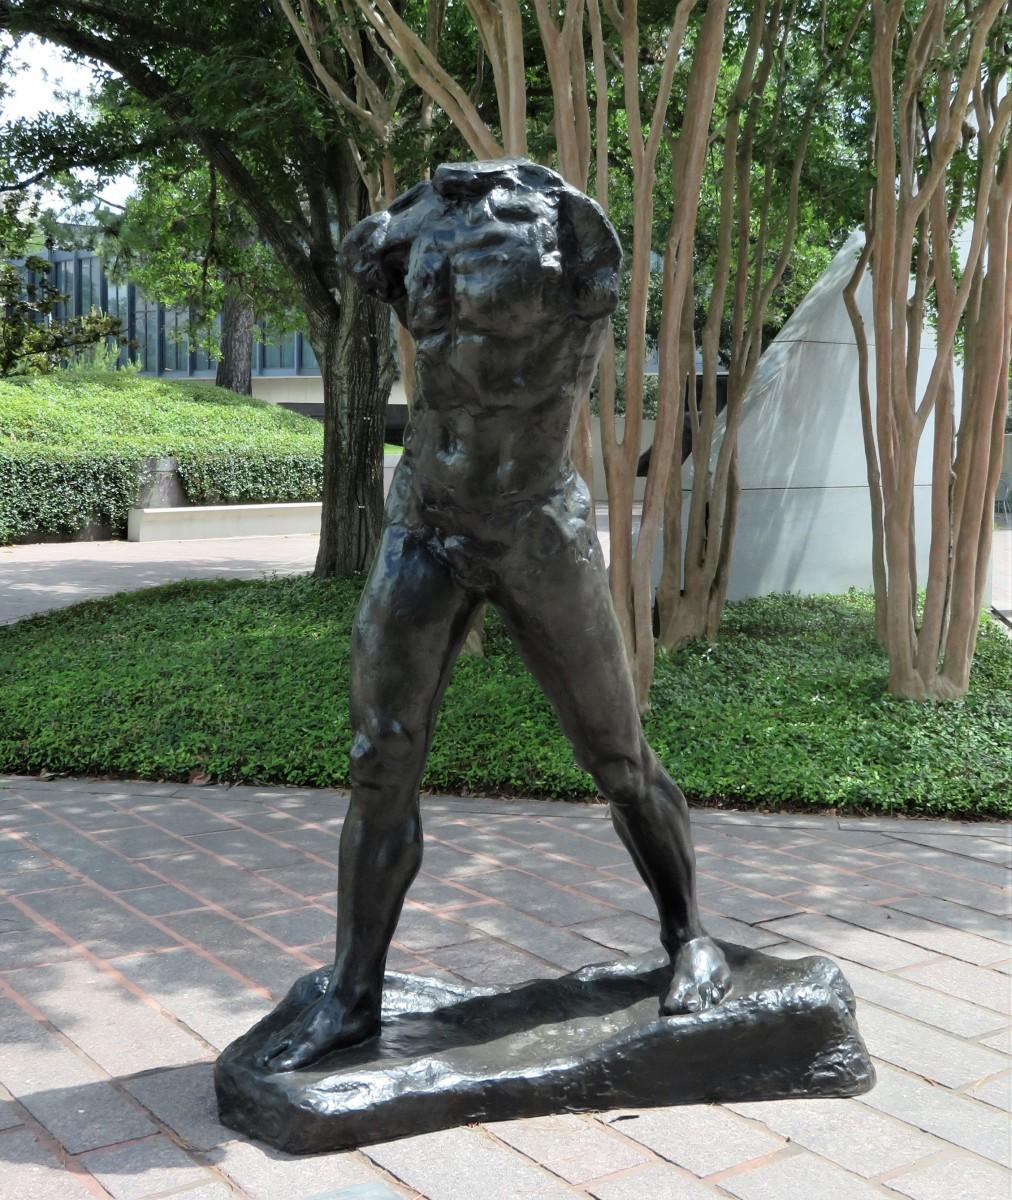 The Walking Man by Auguste Rodin